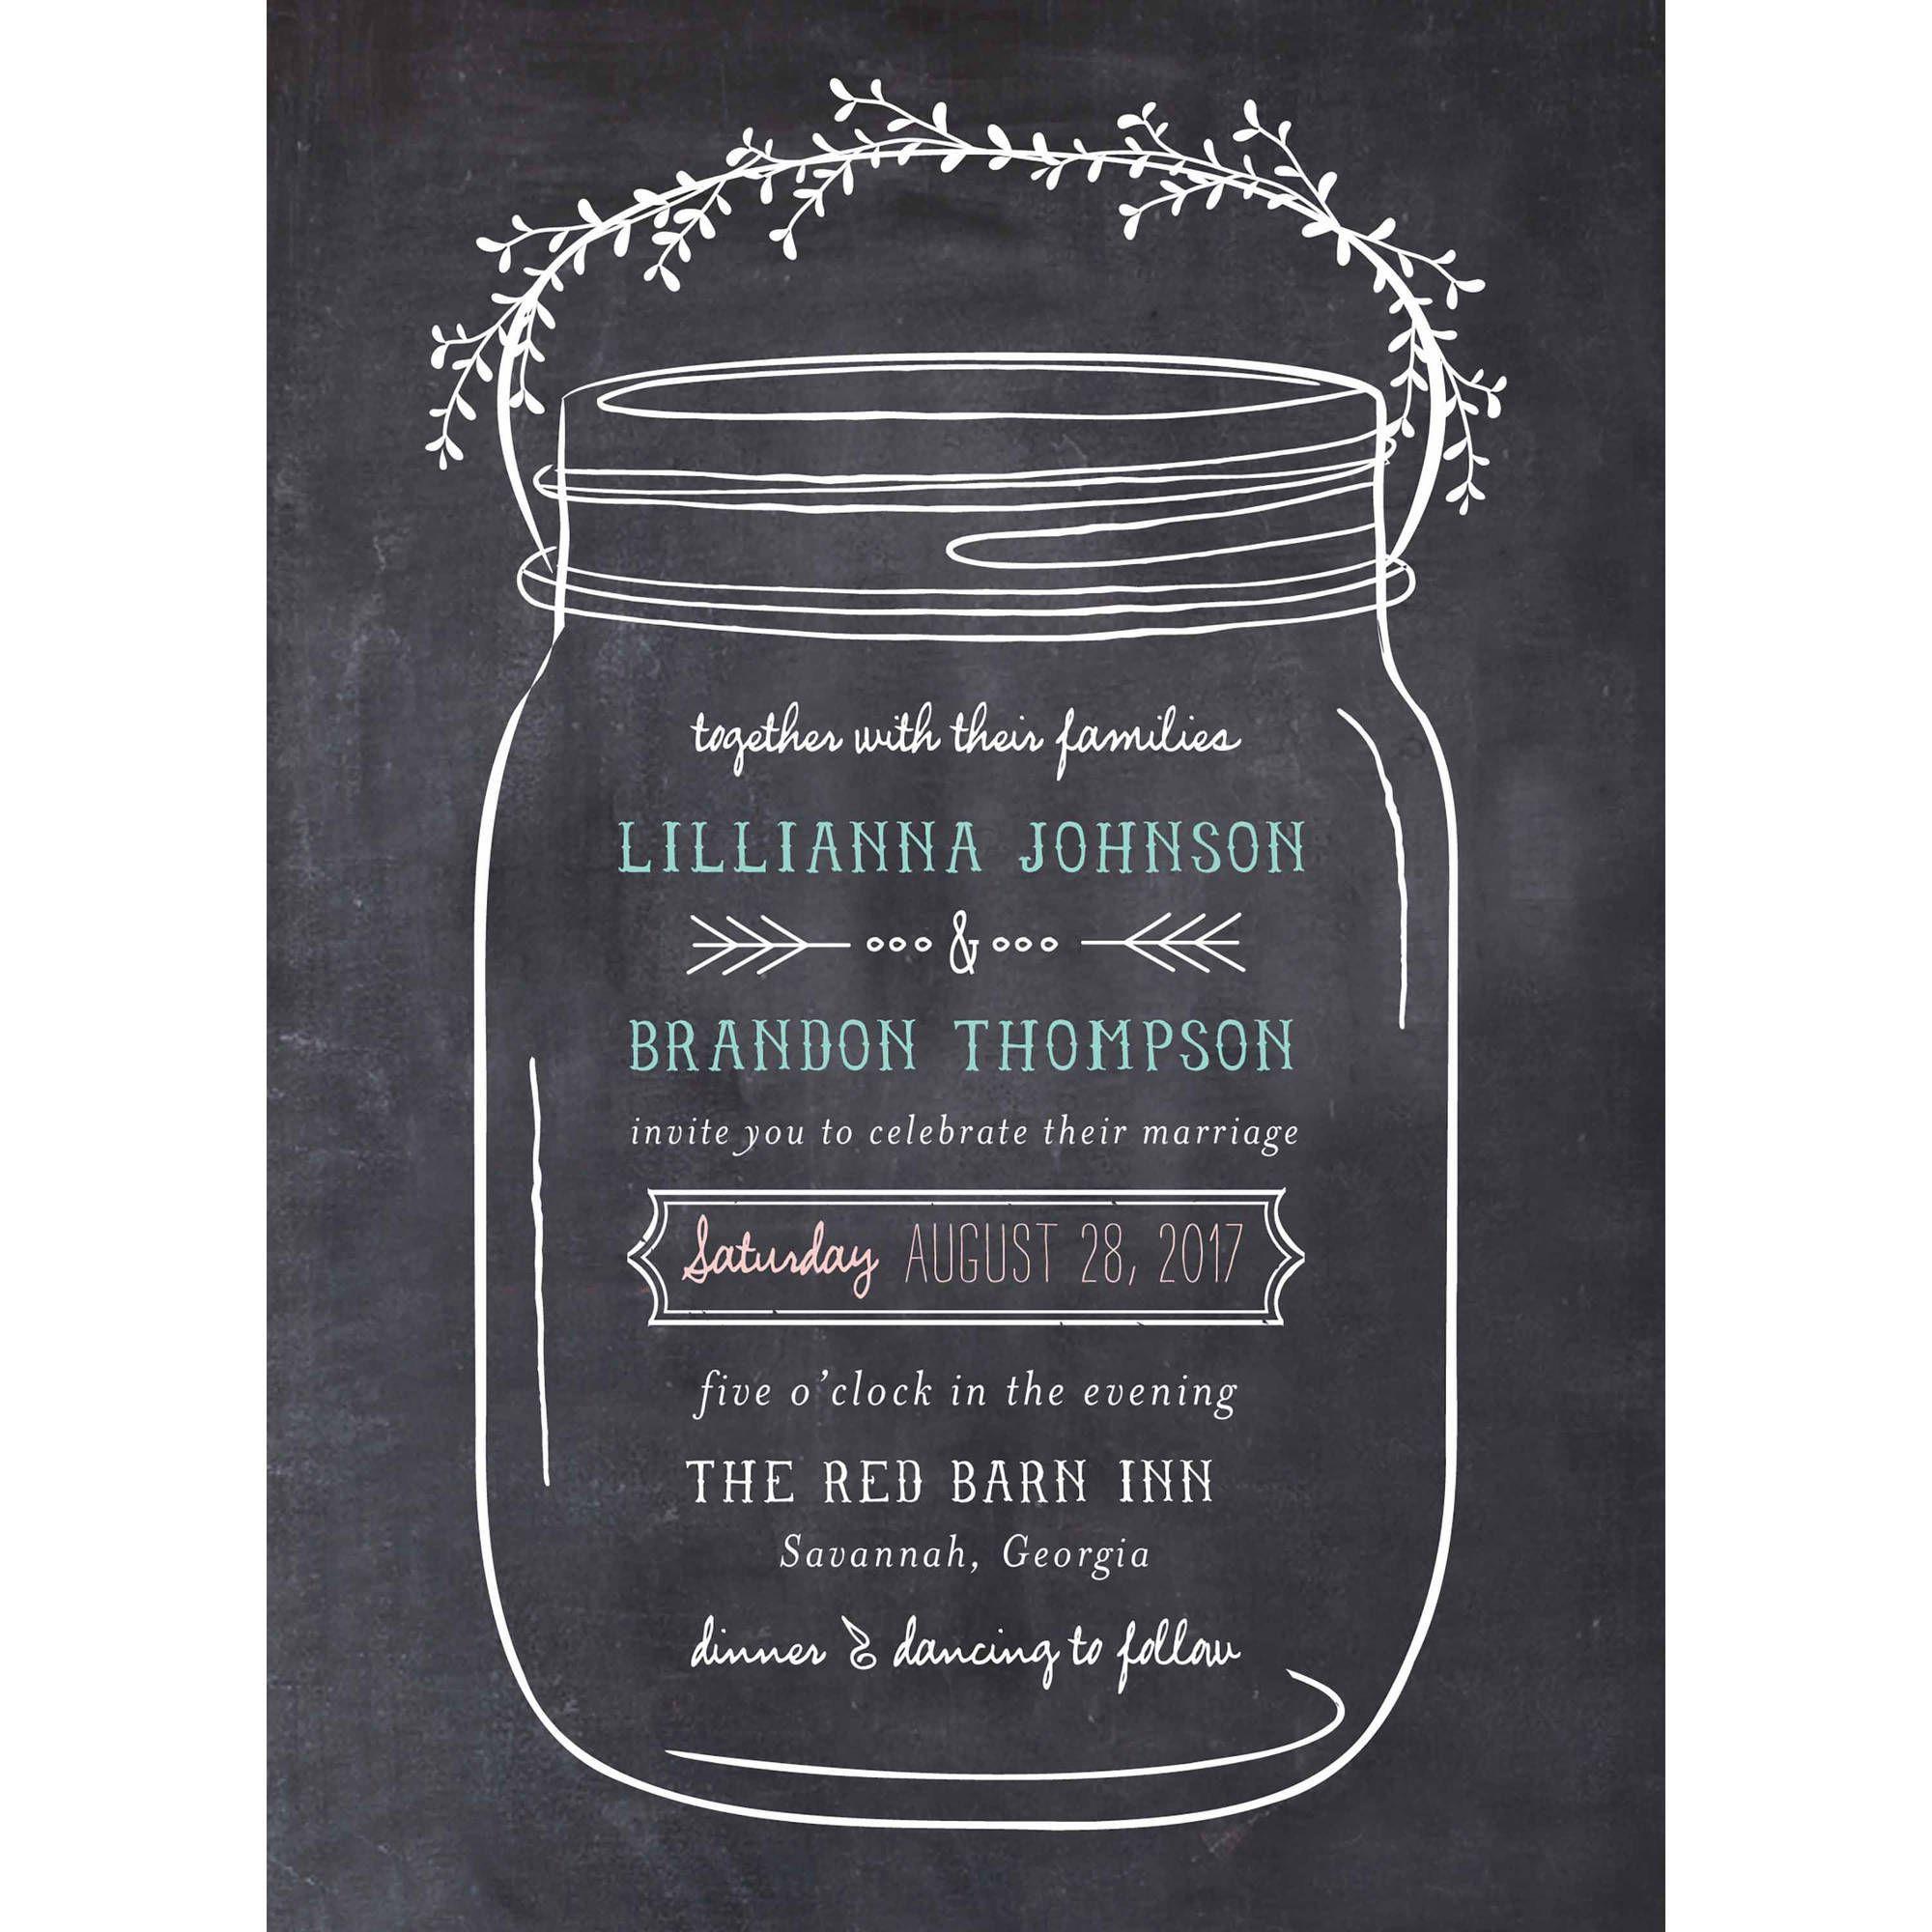 004 Staggering Mason Jar Invitation Template Image  Free Wedding Shower RusticFull